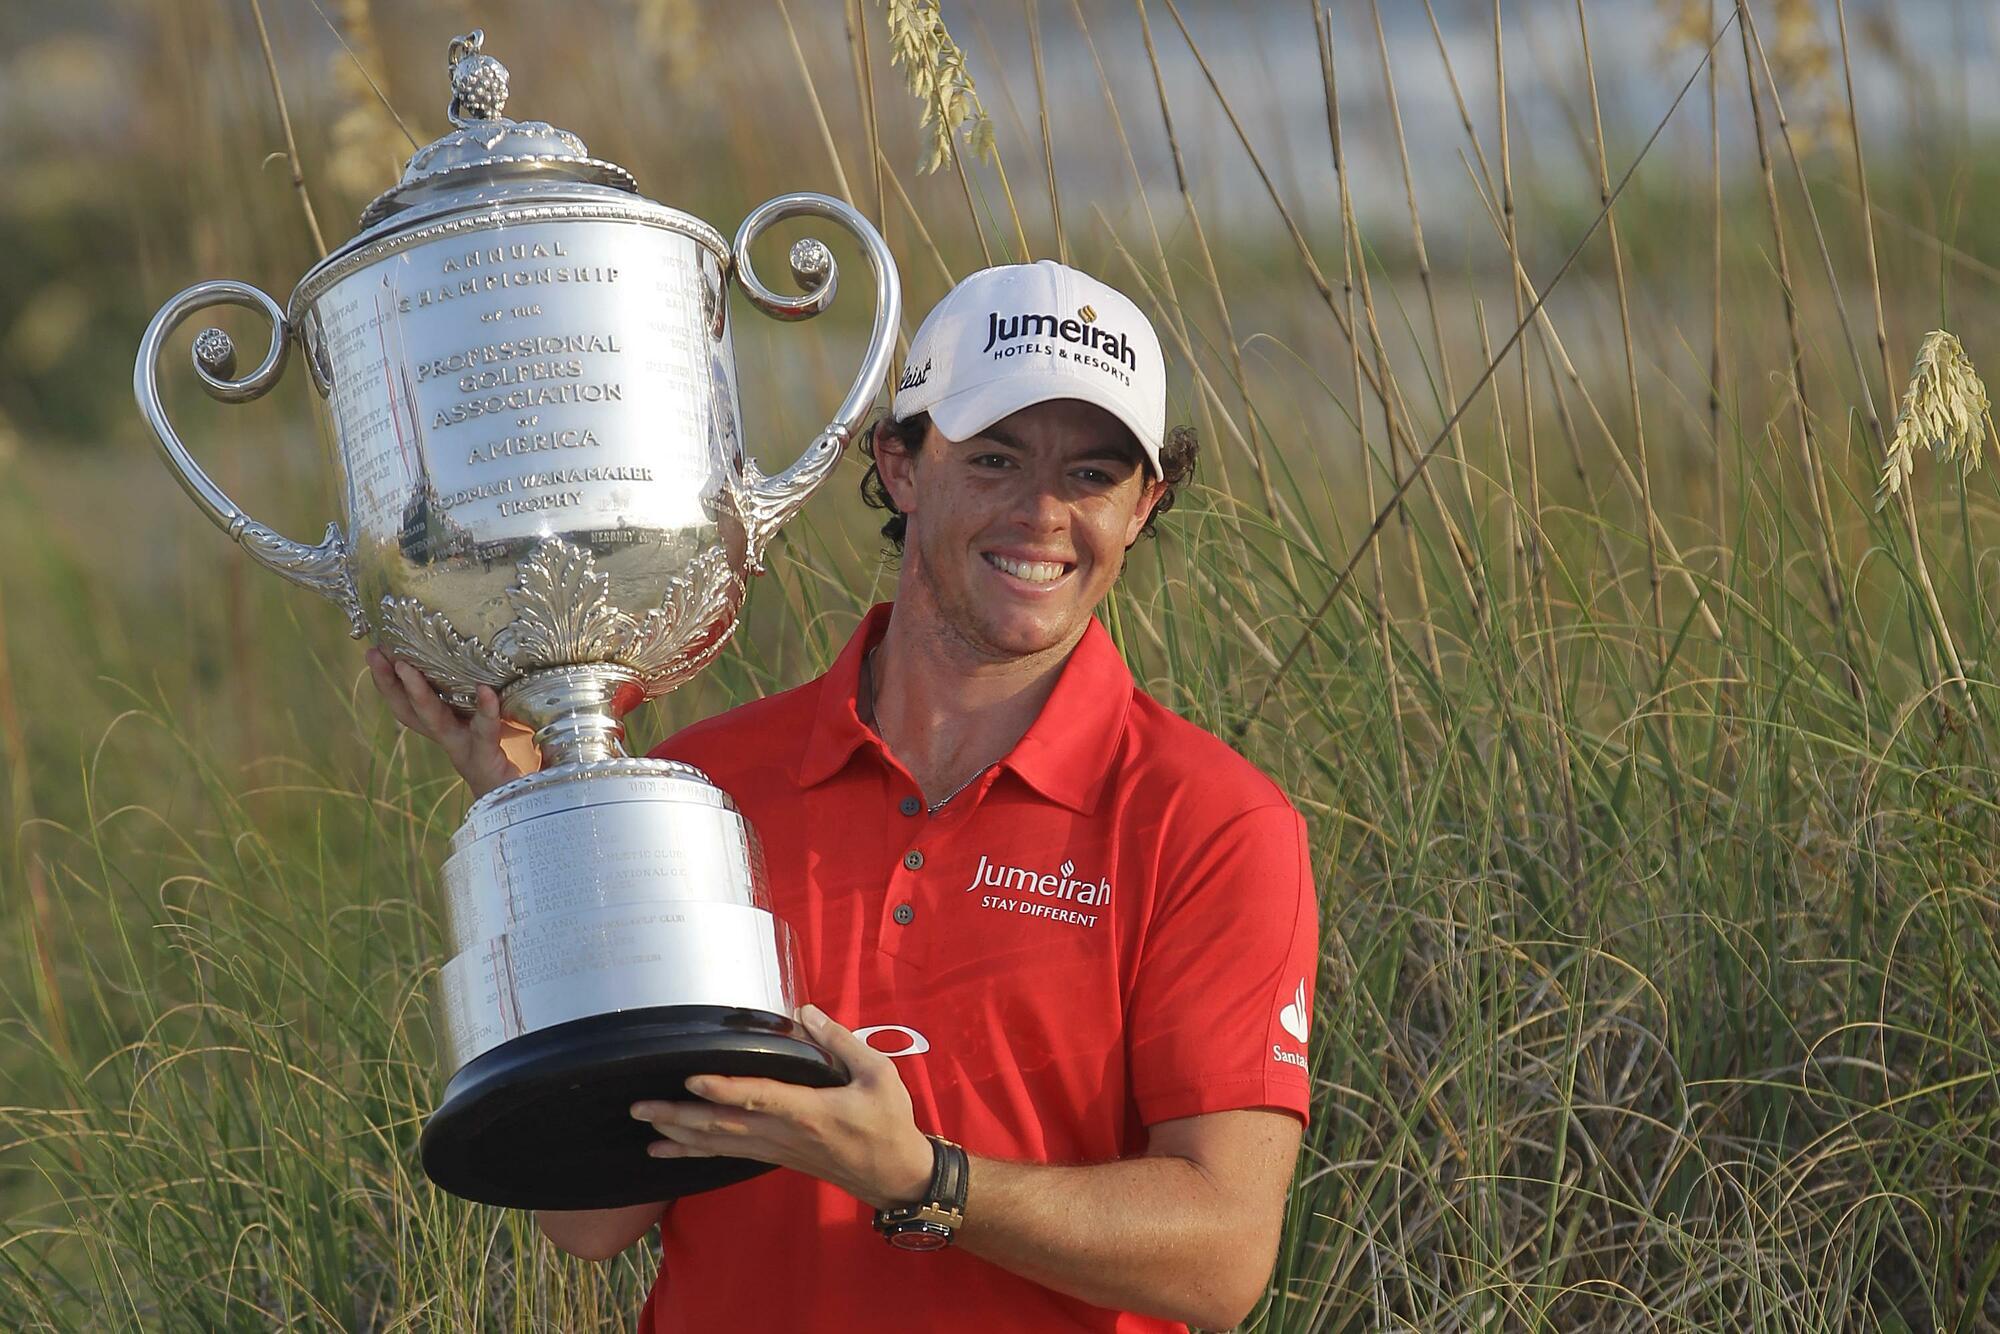 McIlroy lifts the PGA Championship trophy at Ocean Stadium 2012. Photo: AP